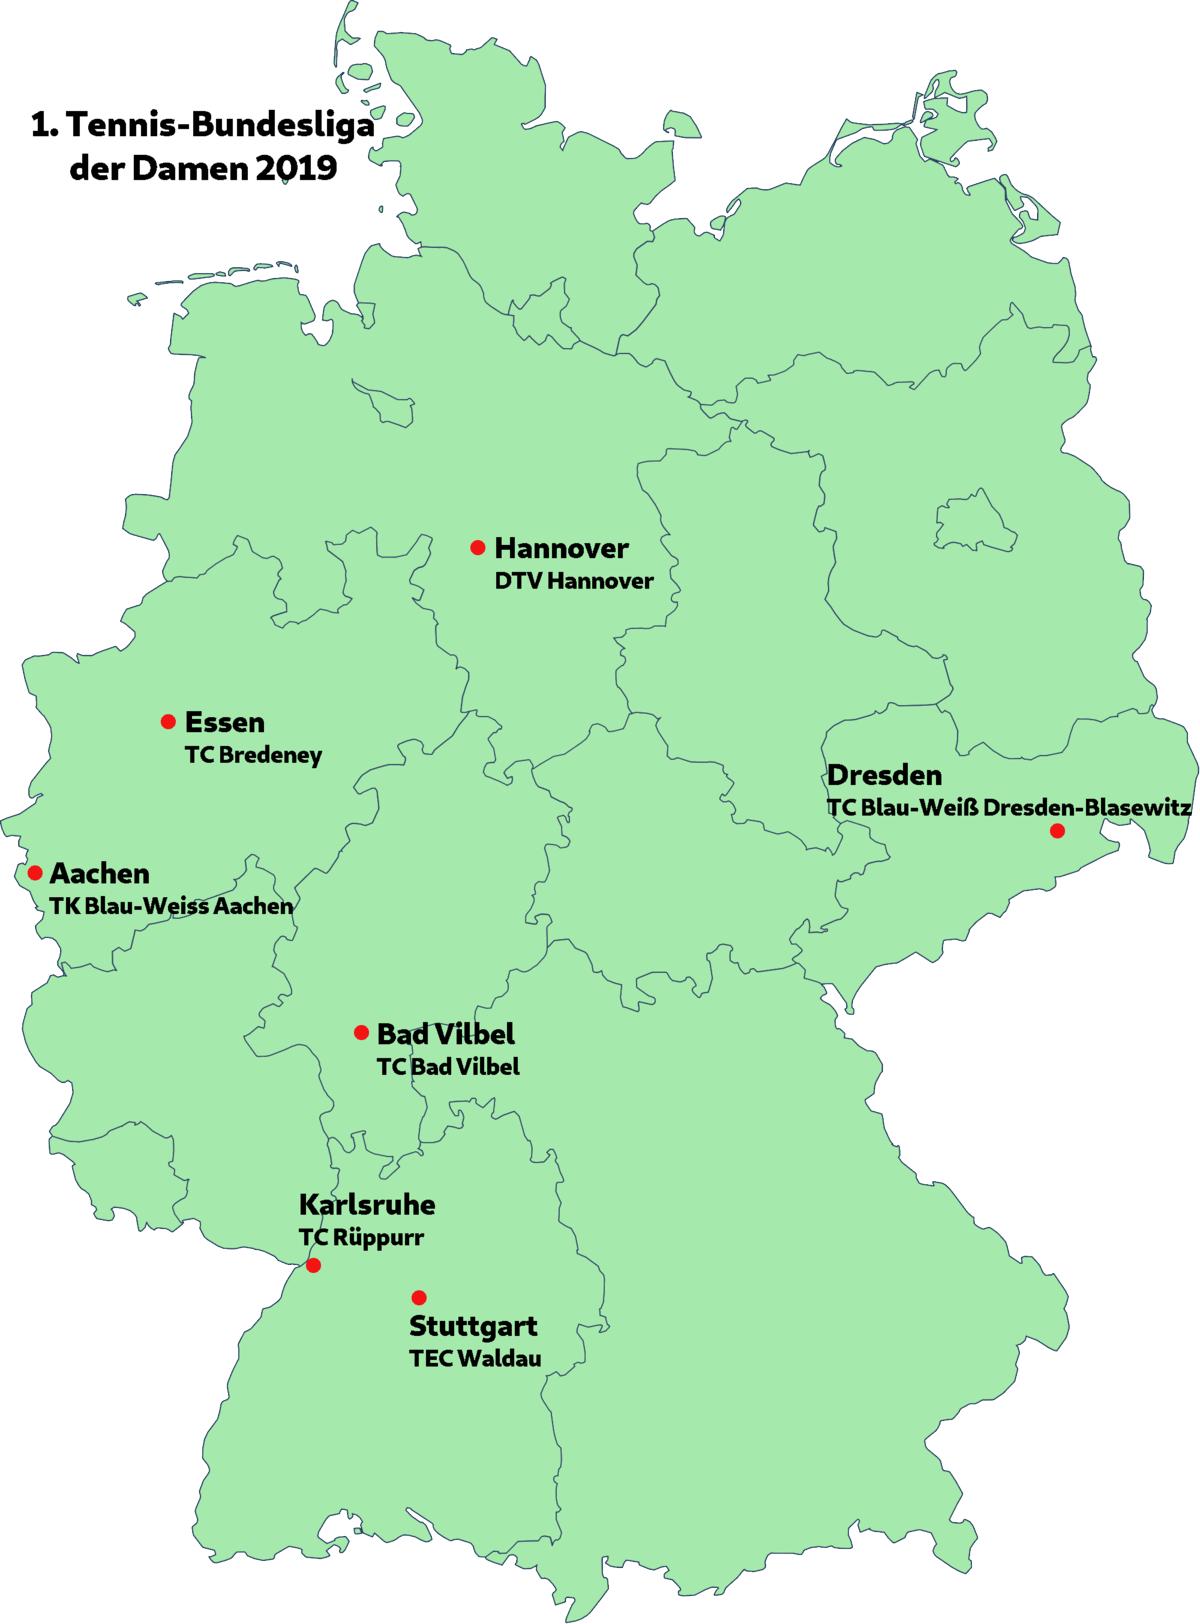 1. Bundesliga Tennis